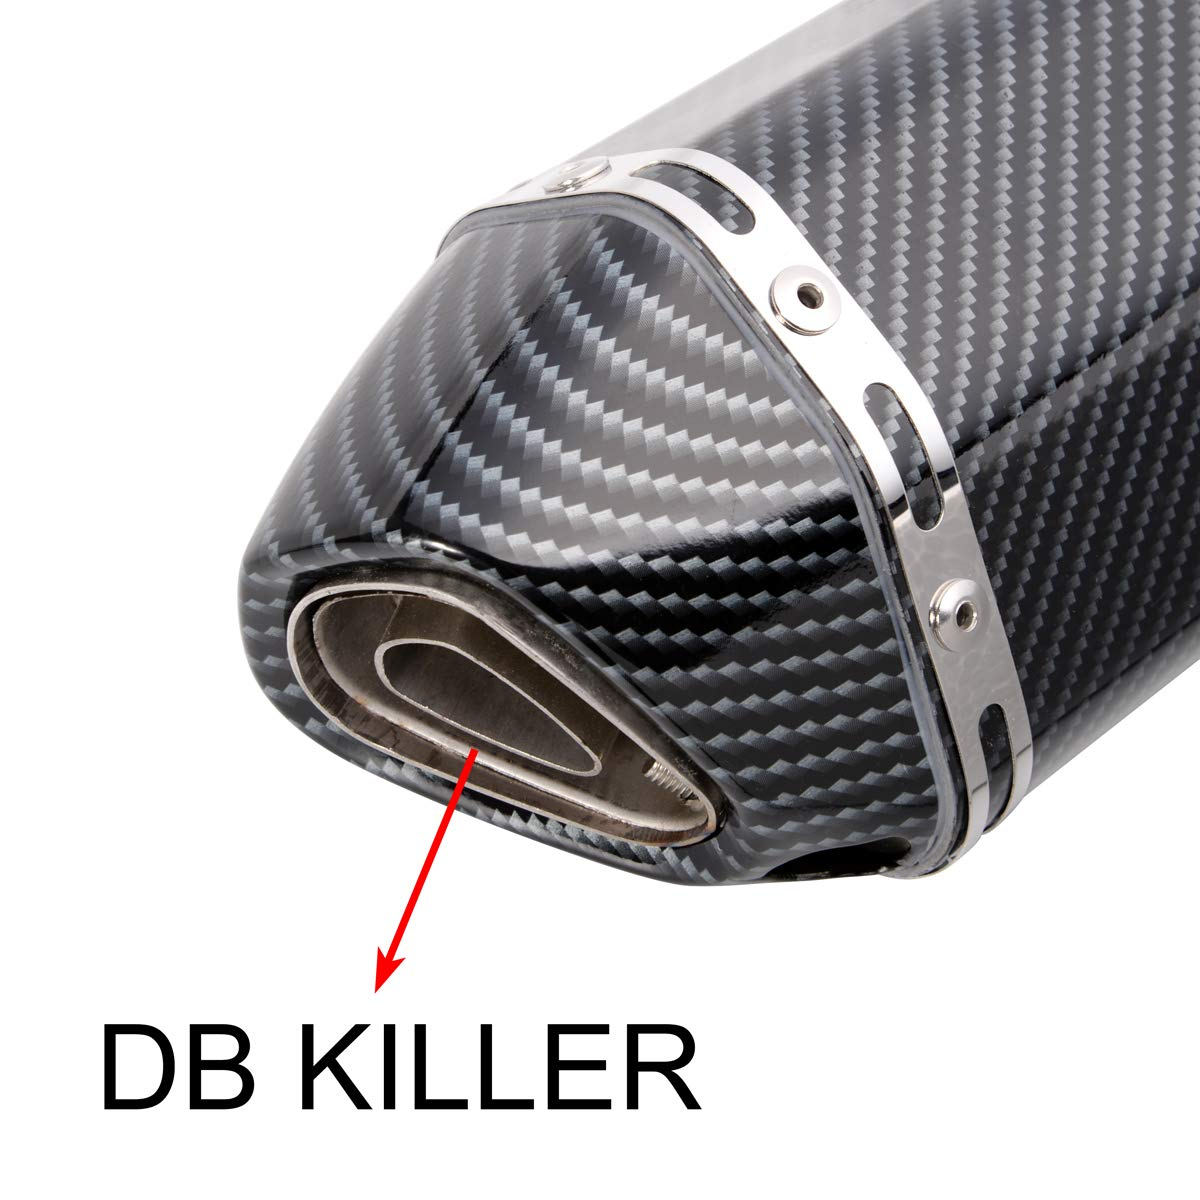 dirt bikes scooters Heran 38-51mm Universal Motorcycle Exhaust Muffler Slip On w//DB Killer fits most motorcycles